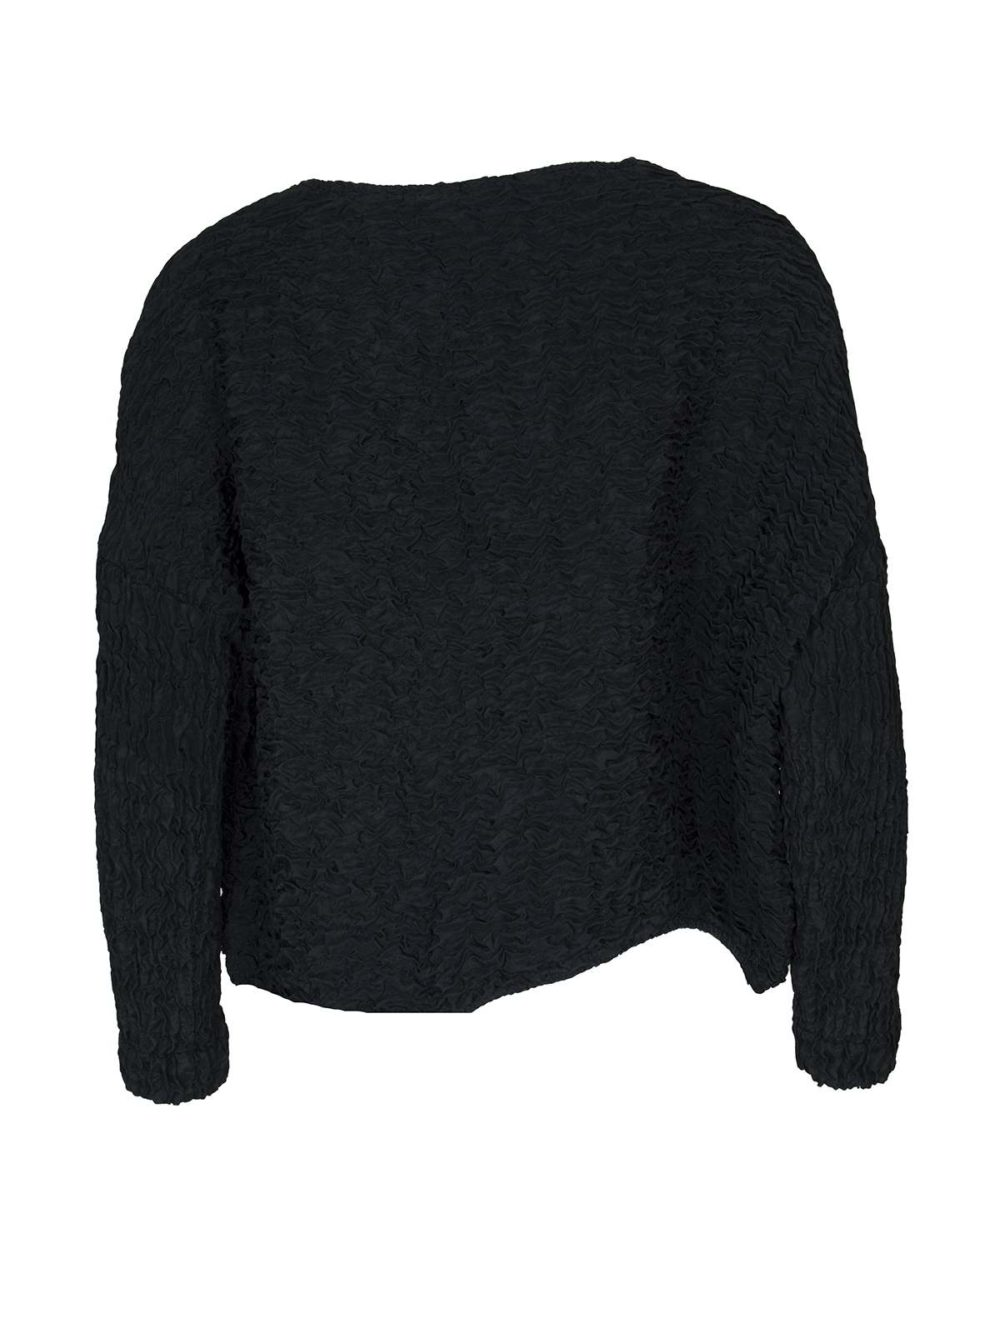 Blouse 51890-S40 Grizas Katie Kerr Women's Clothing